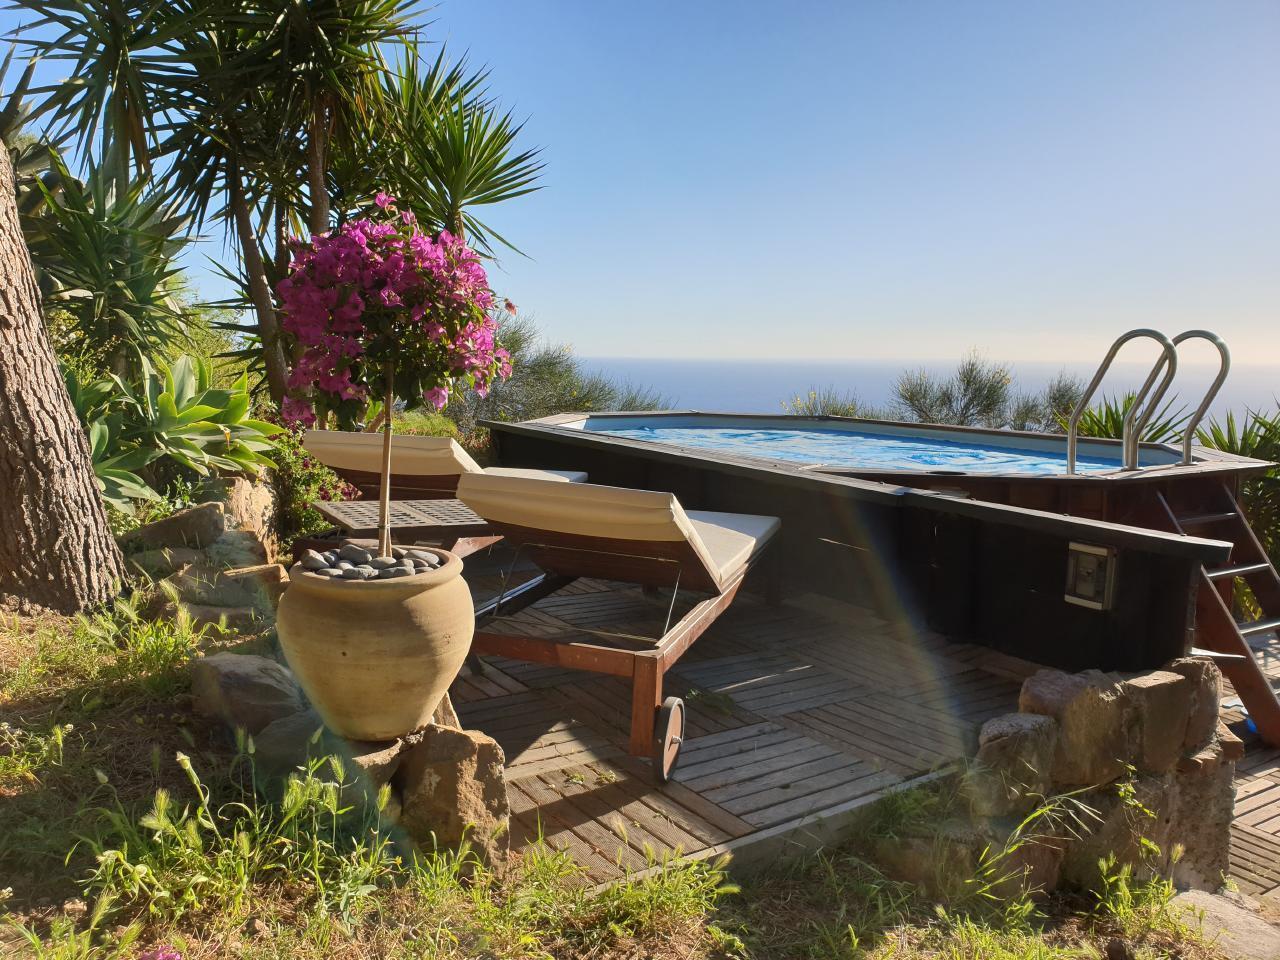 Maison de vacances Casetta Eoliana Lipari Inseln, pool, sauna. (827872), Lipari, Lipari, Sicile, Italie, image 28